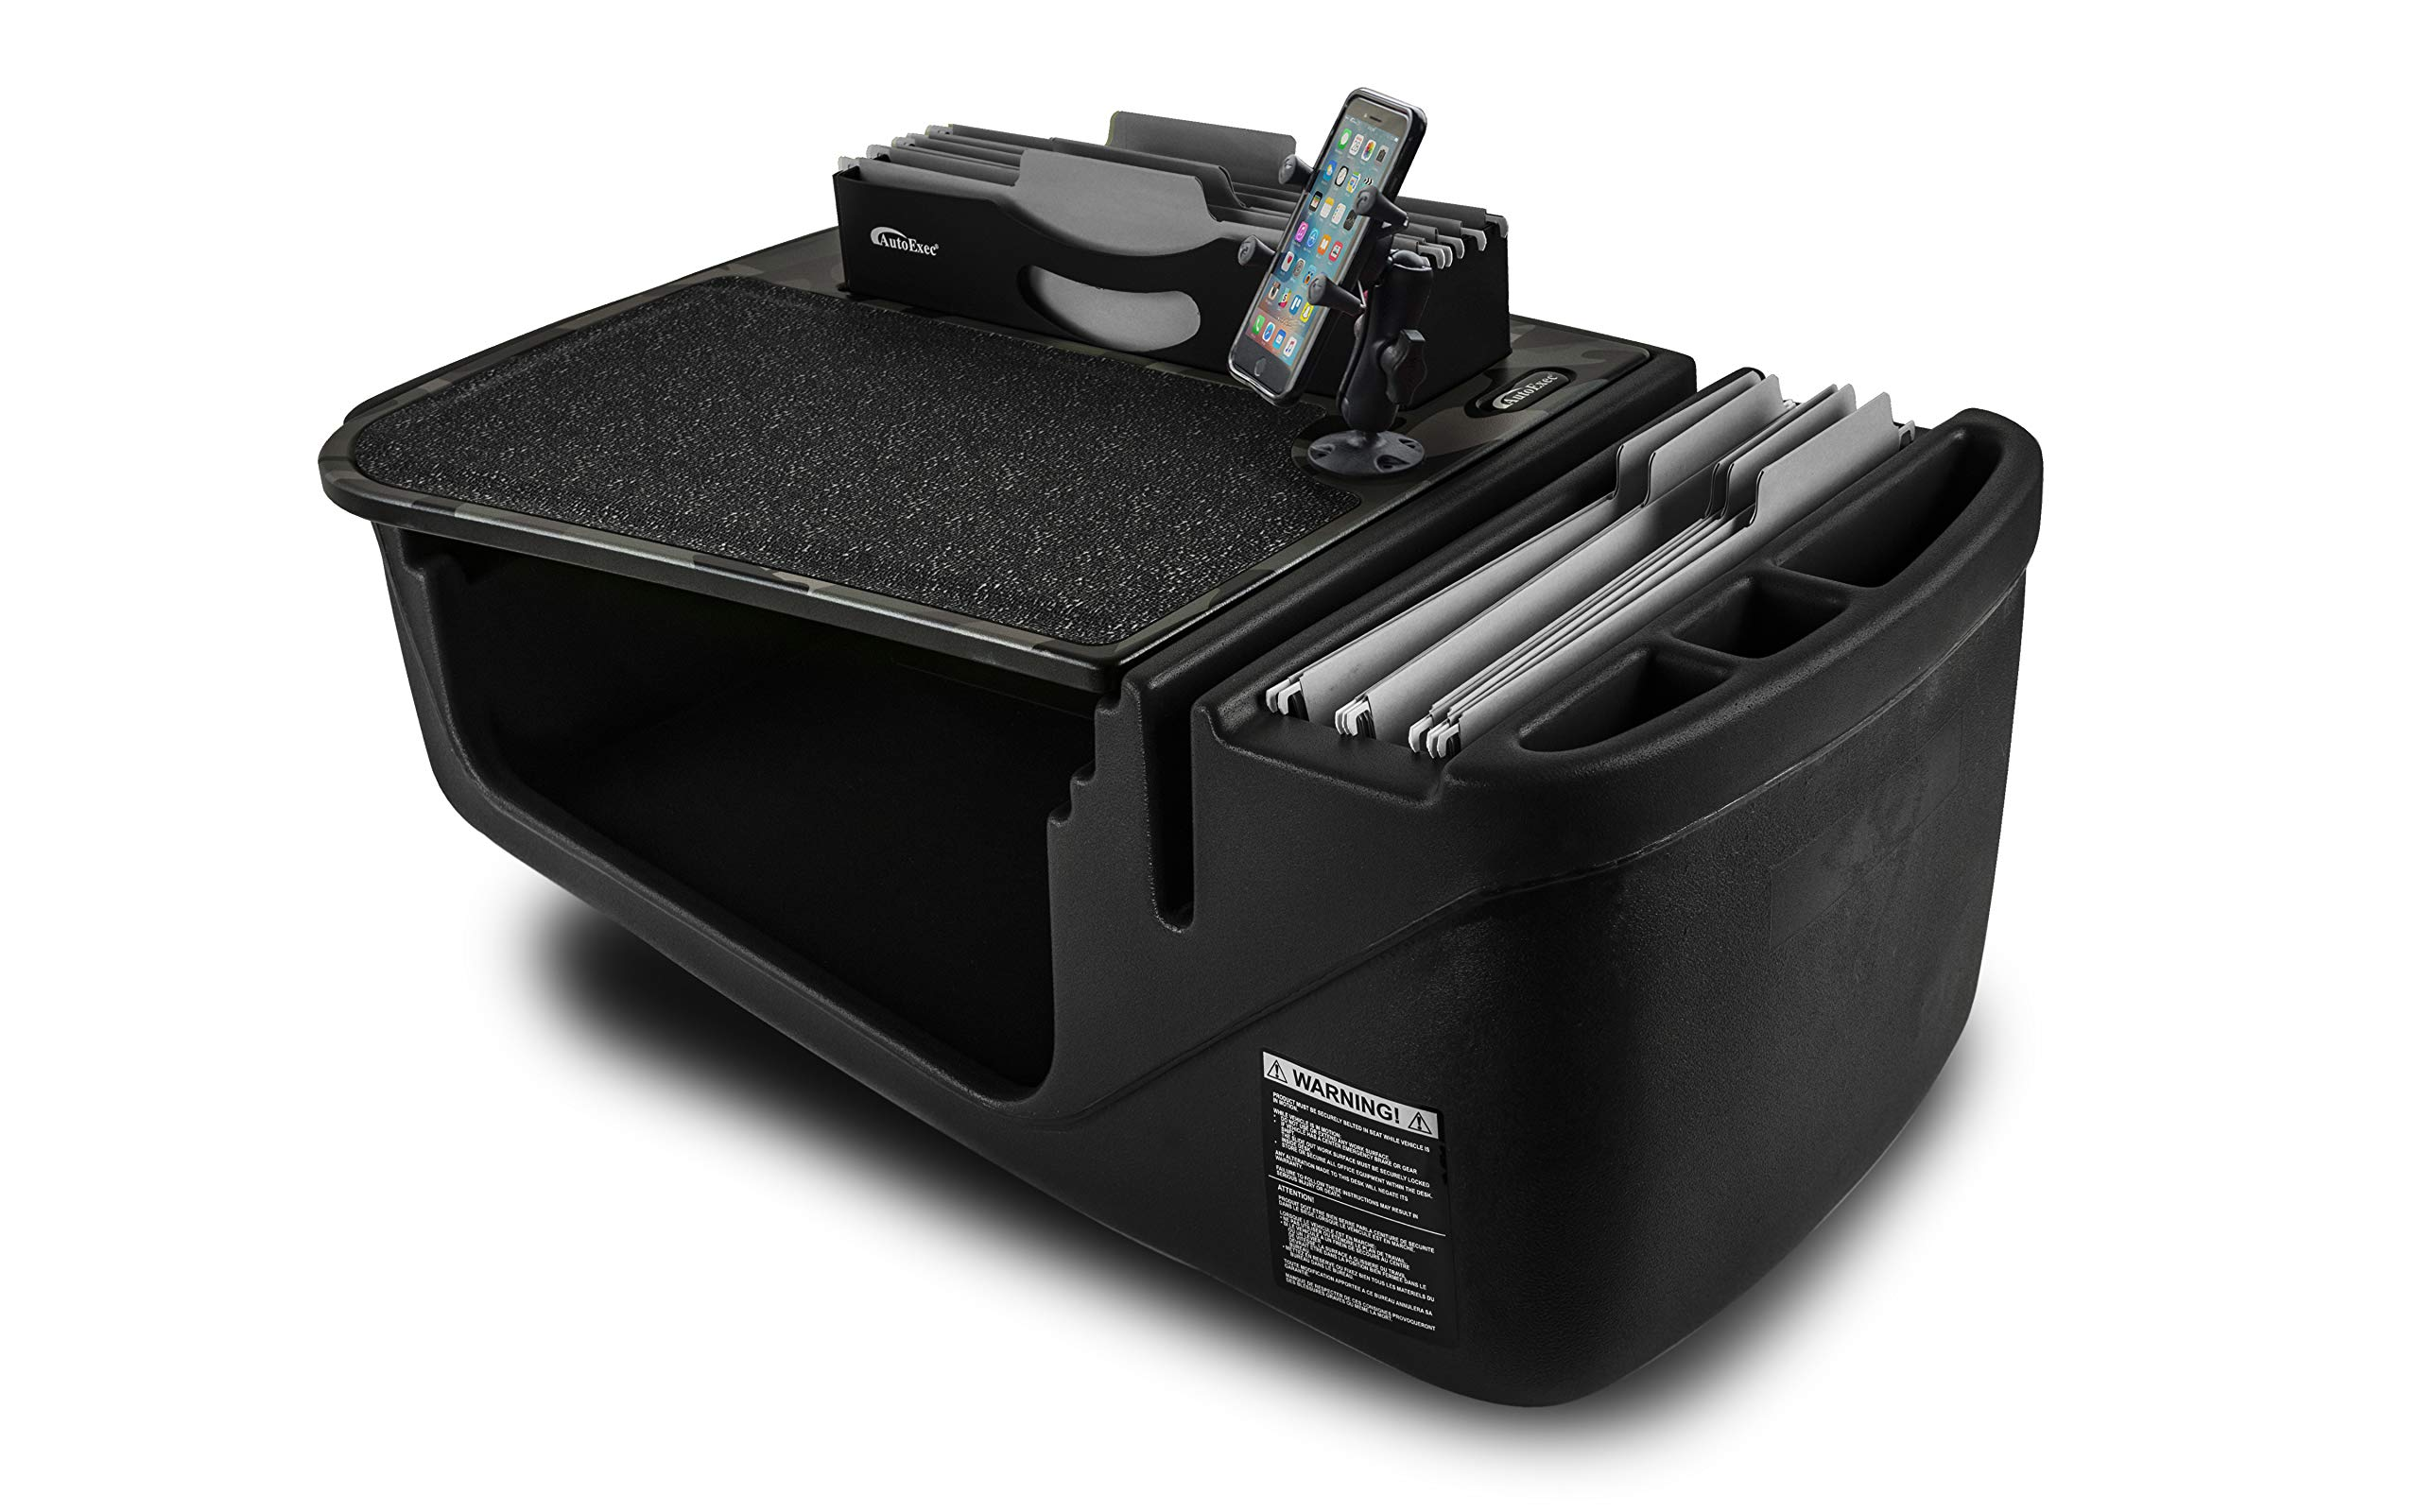 AutoExec AUE28506 FileMaster Built-in Power Inverter and X-Grip Phone Mount Car Desk AESFile-03 GC